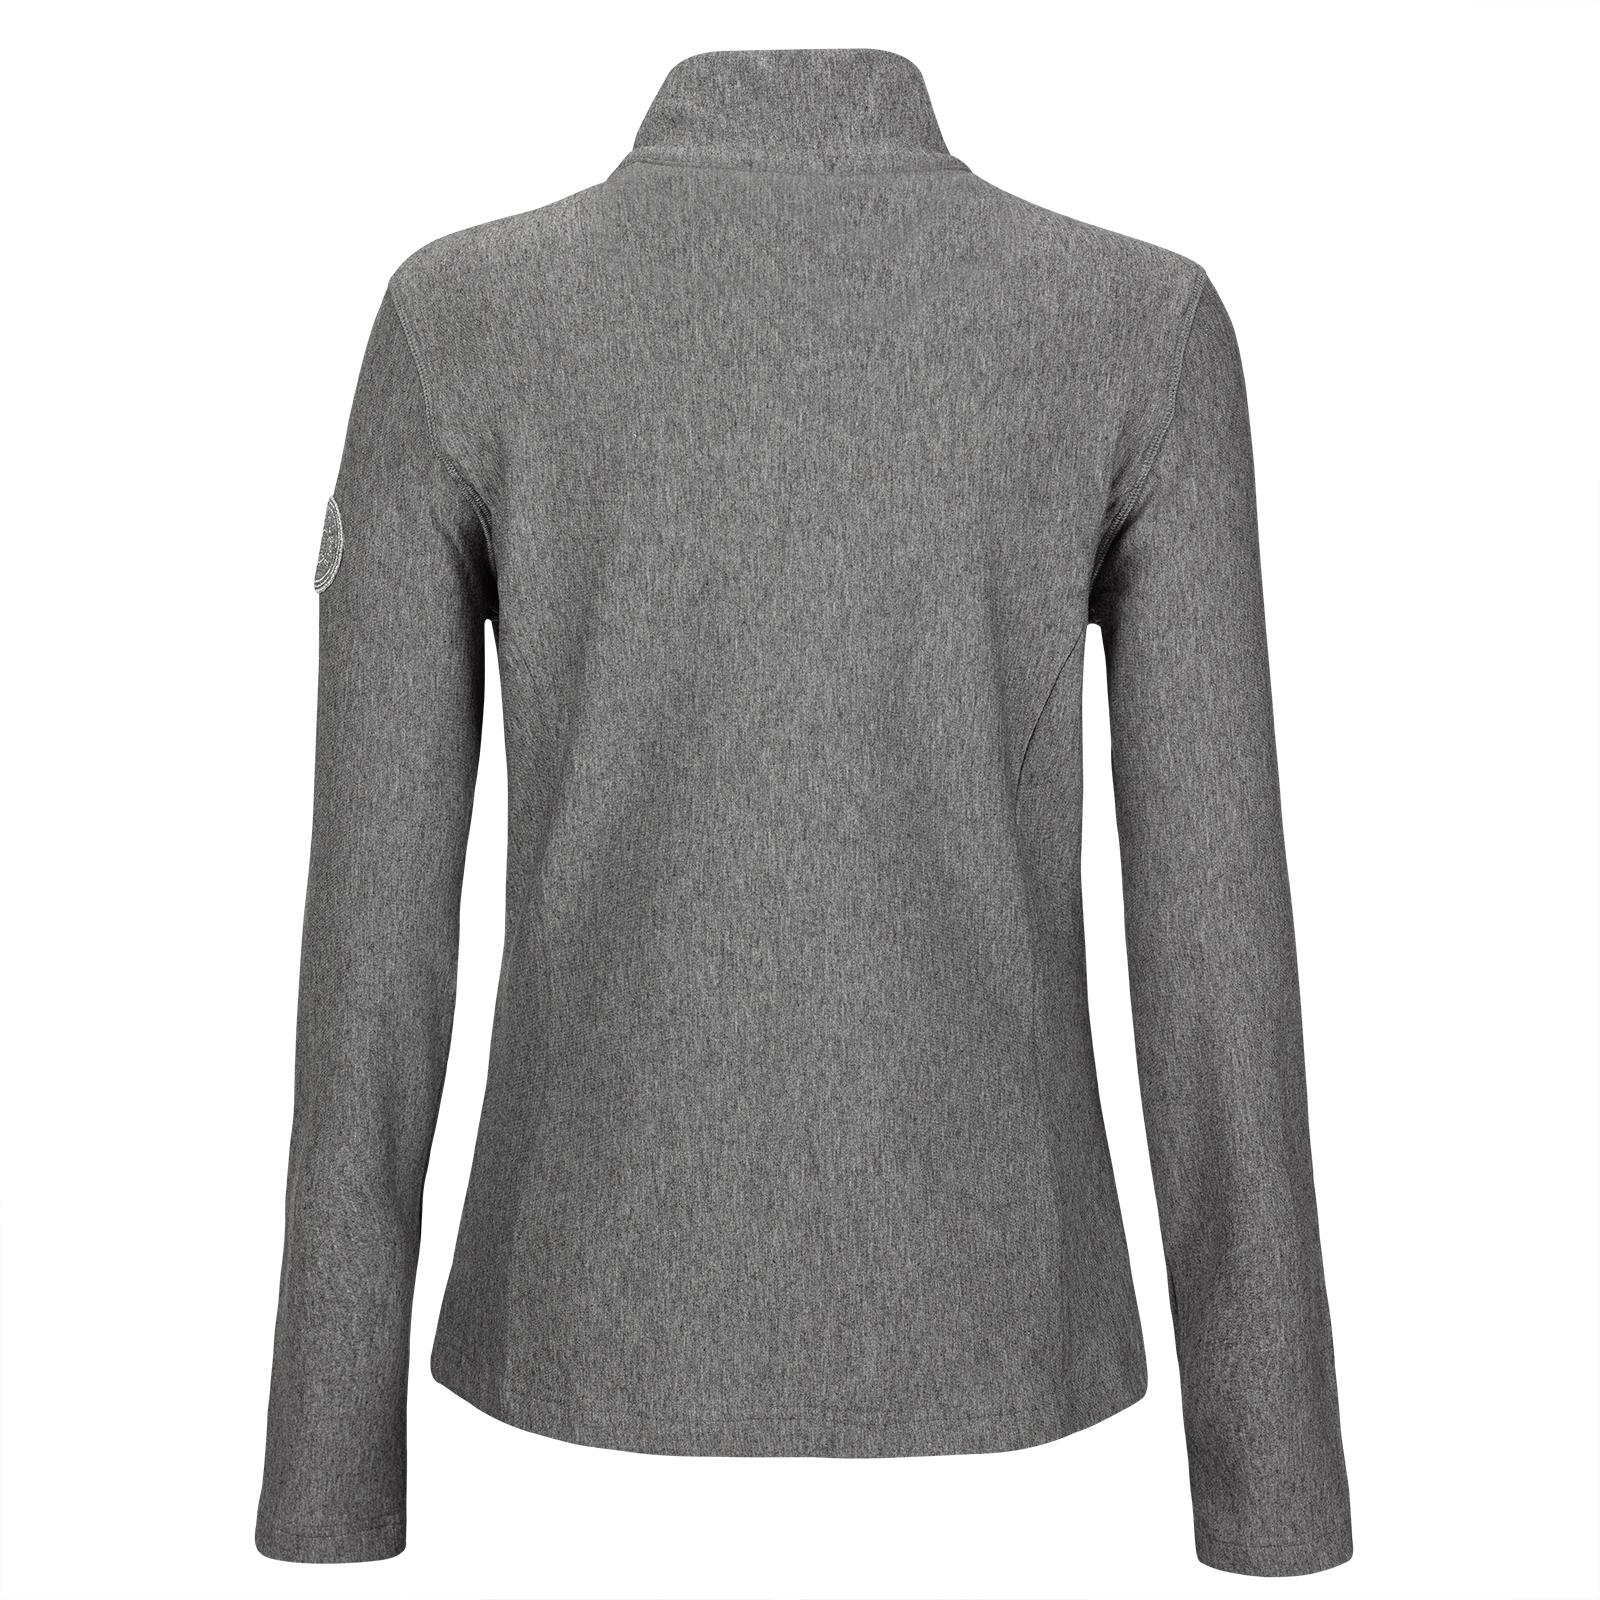 Damen Zip-Sweatshirt mit Cold Protection Funktion